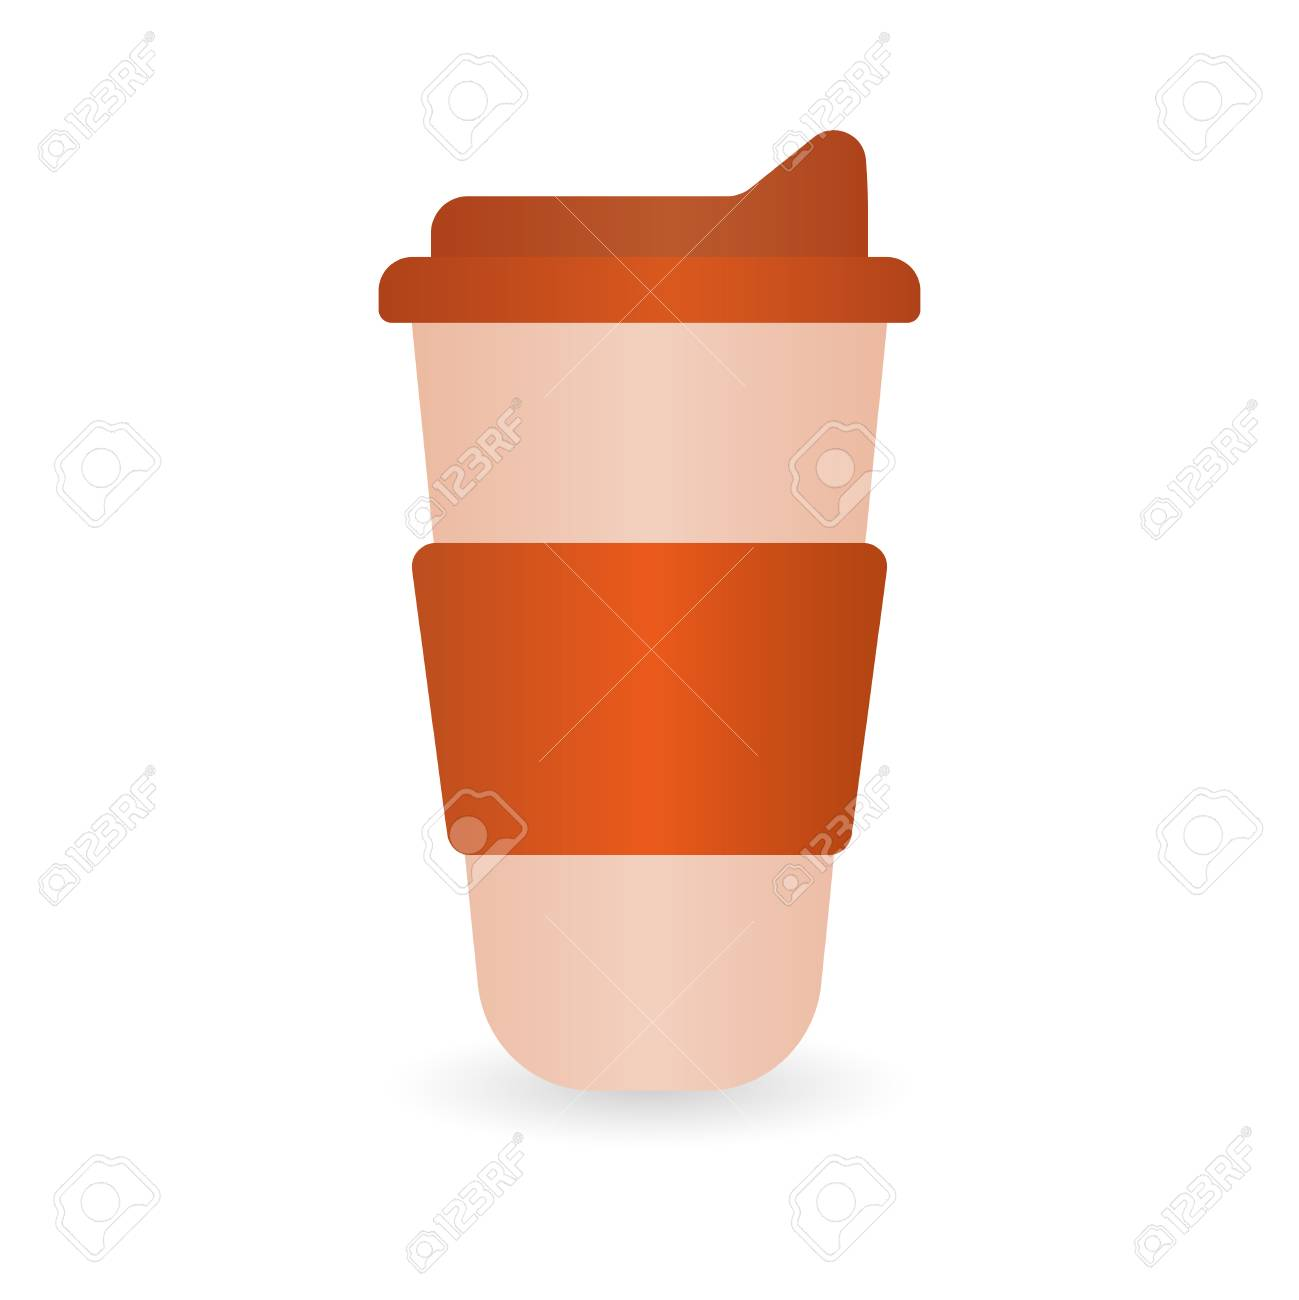 Thermos MockupRealistic Illustration Of Red Thermos Mug CedBxWro